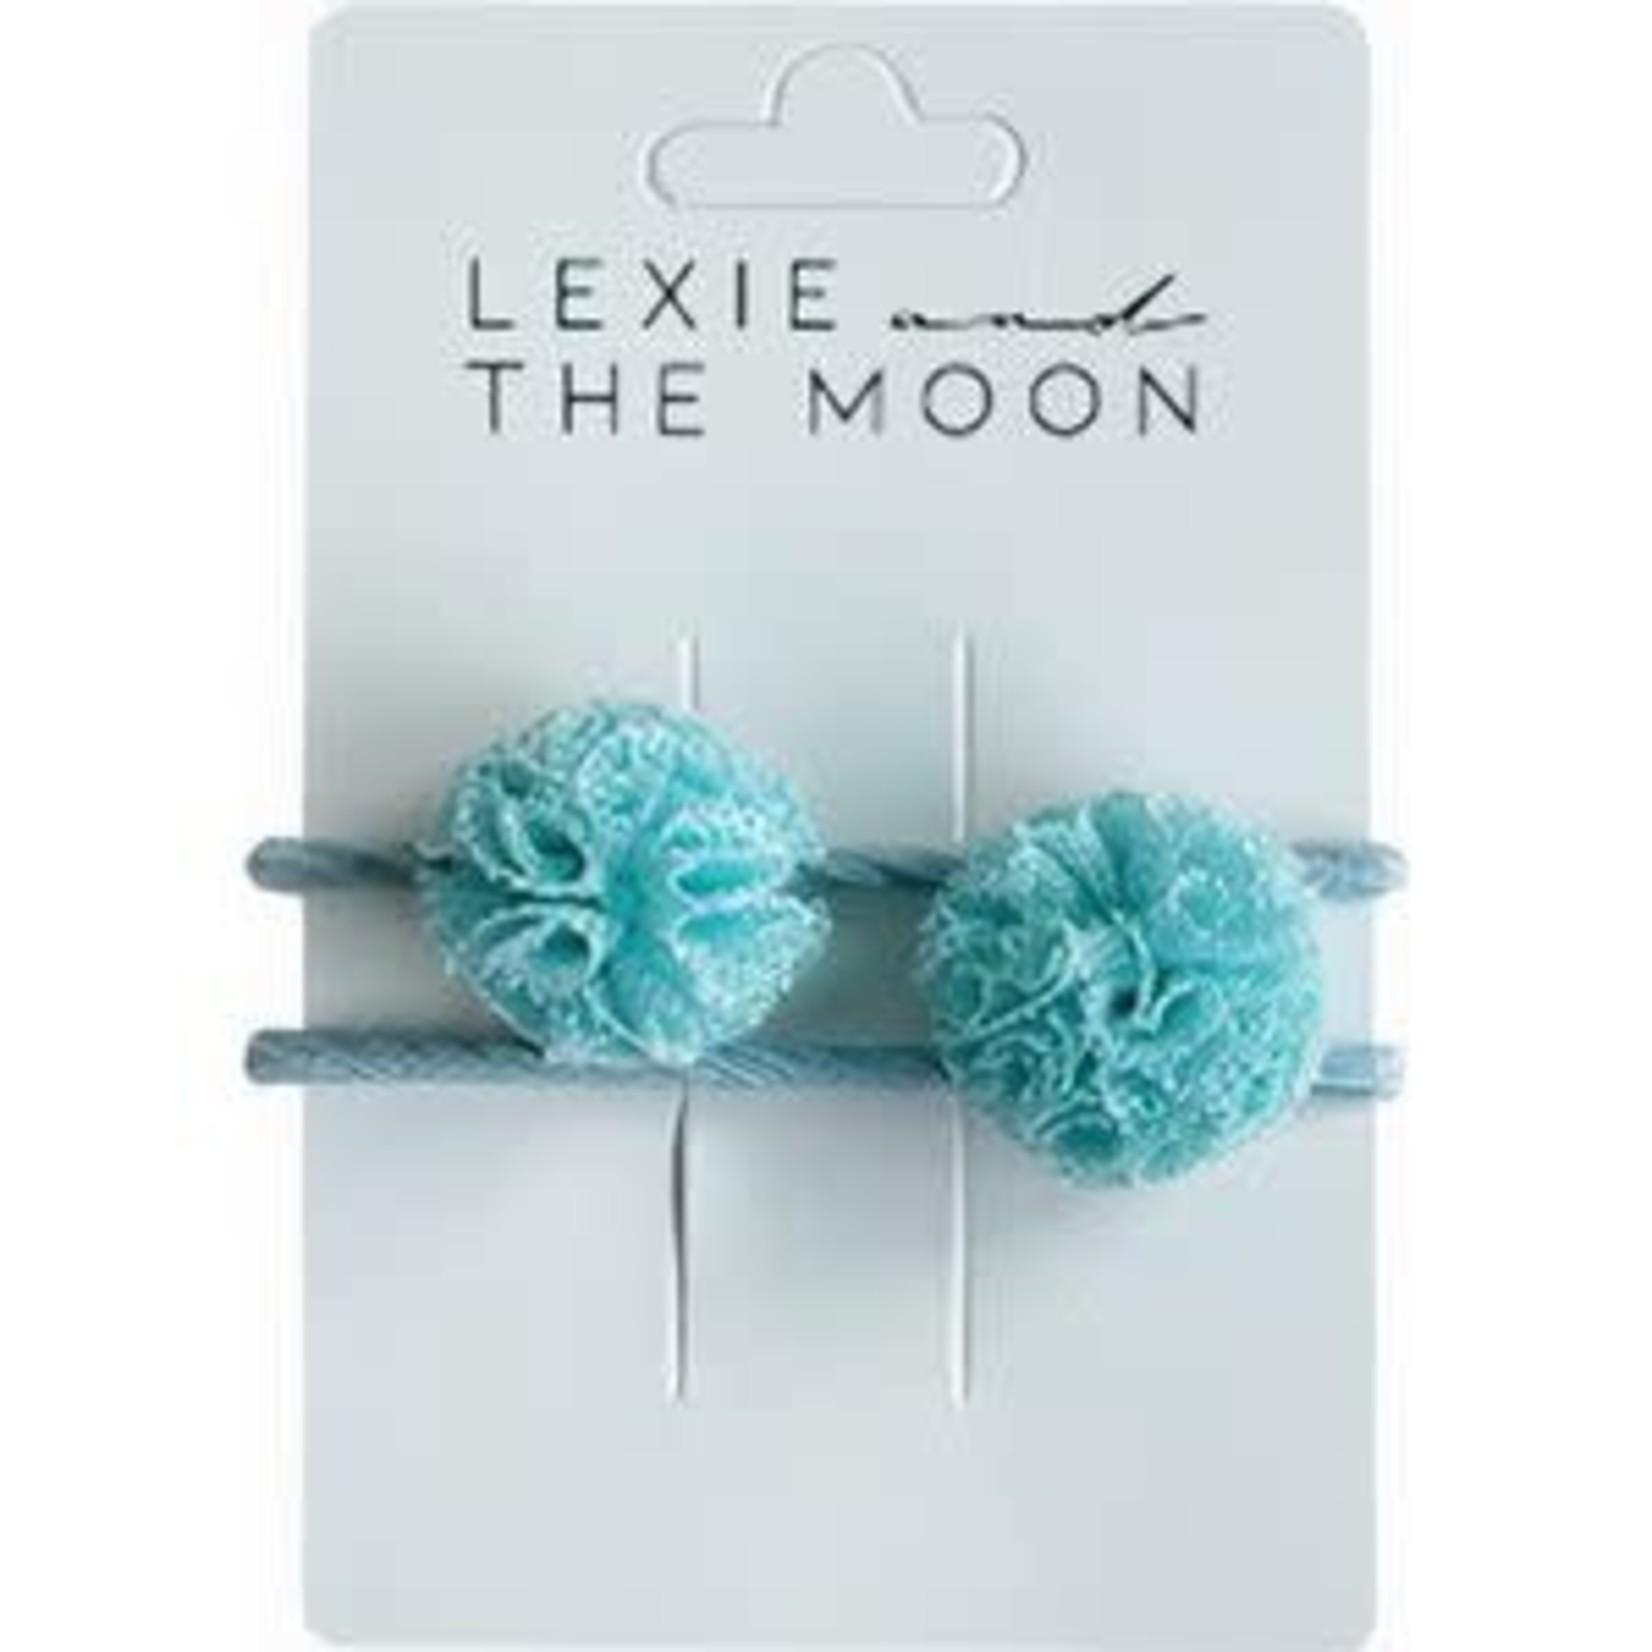 LEXIE AND THE MOON LEXIE AND THE MOON elastiekjes pompon